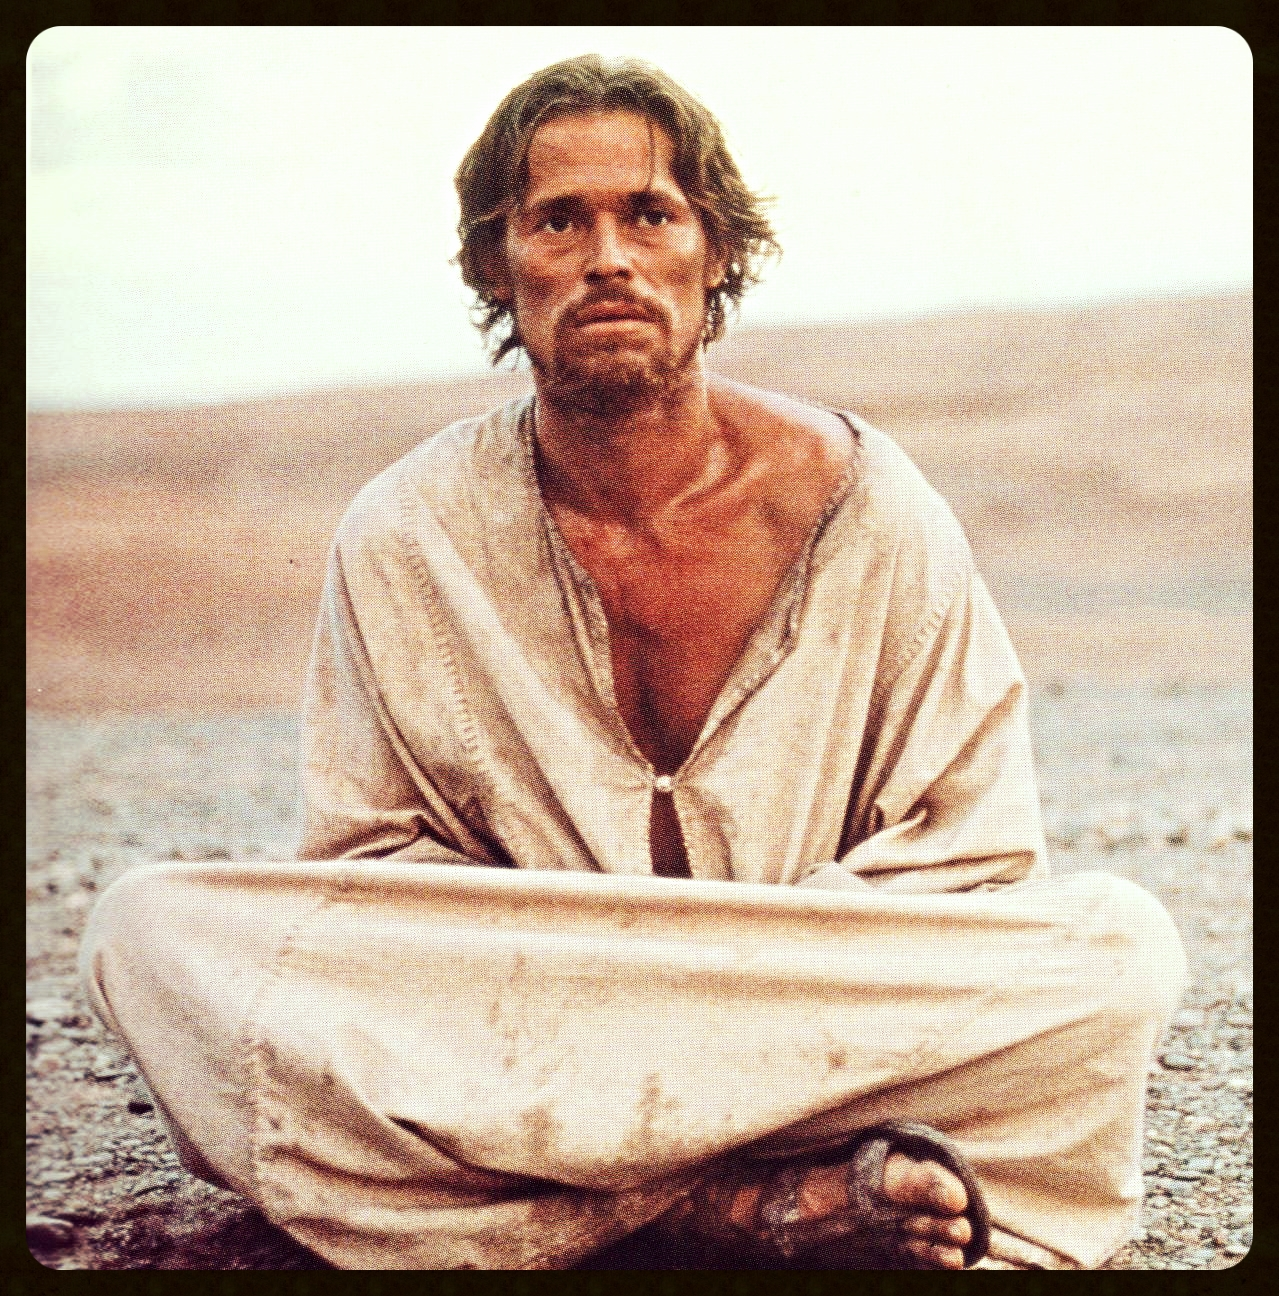 LTC-Jesus-in-desert.jpg